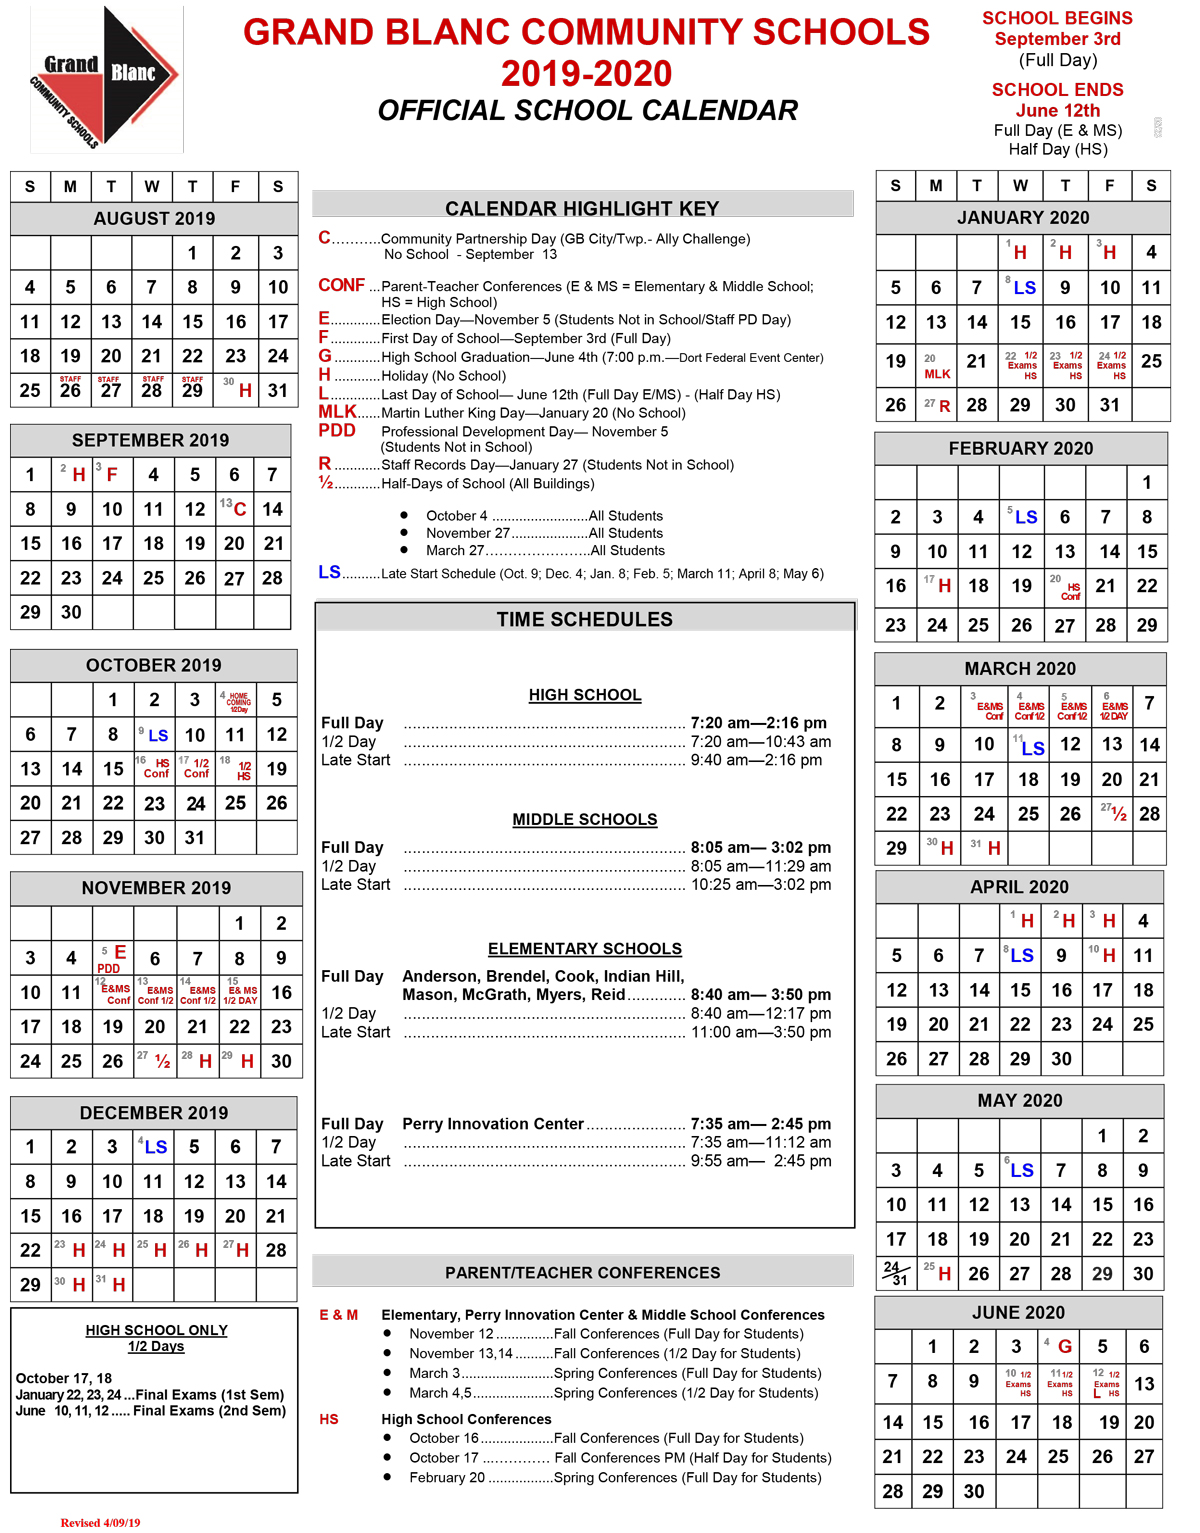 2019-2020 District Calendar is Official!